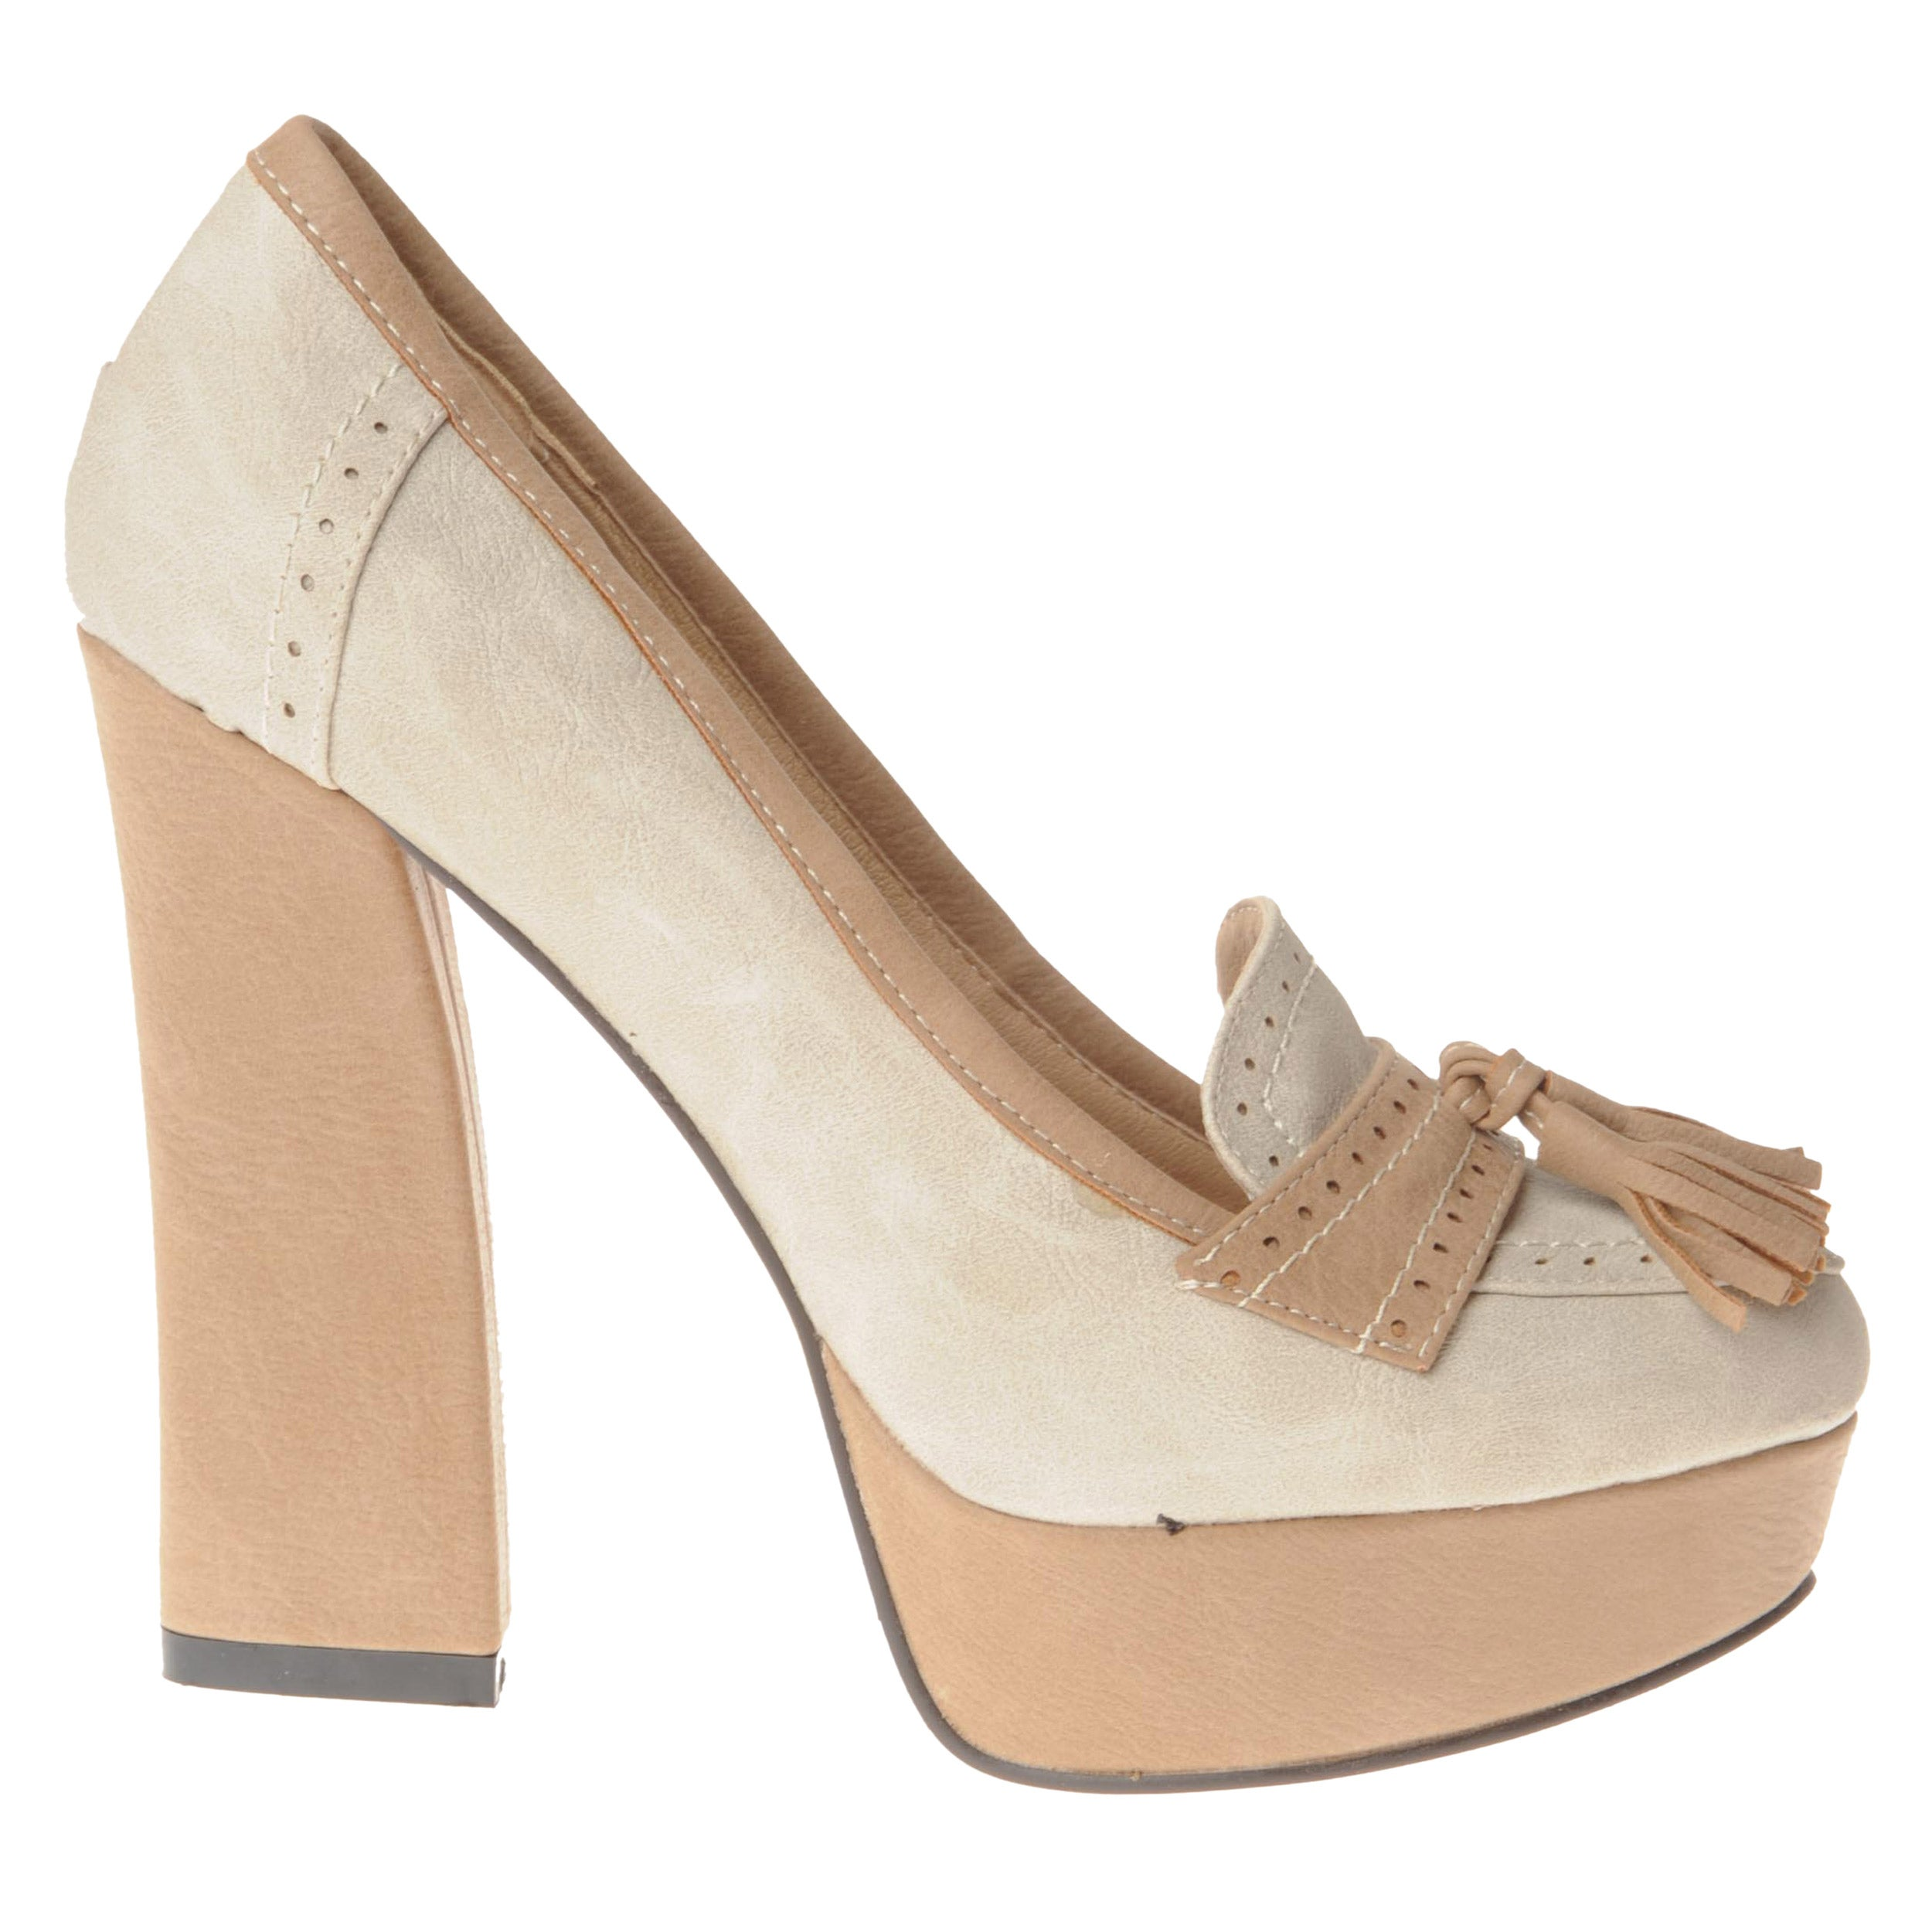 b4f809cb7c Shop Henry Ferrera Women's Loafer Block-heel Pumps - Free Shipping Today -  Overstock - 7641435